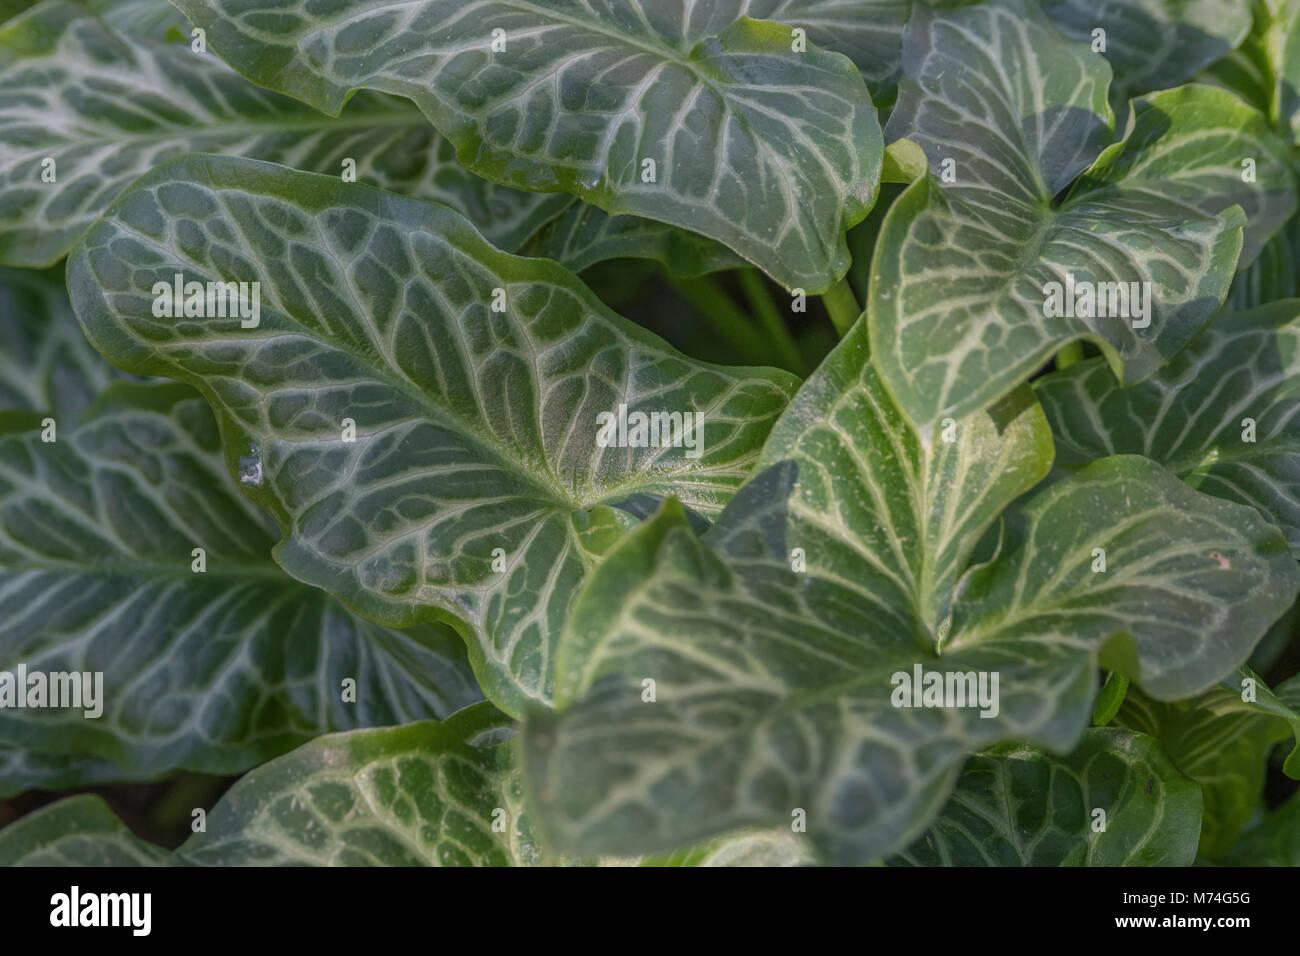 Variegated Leaves Foliage Of Arum Italicum Italian Lords And